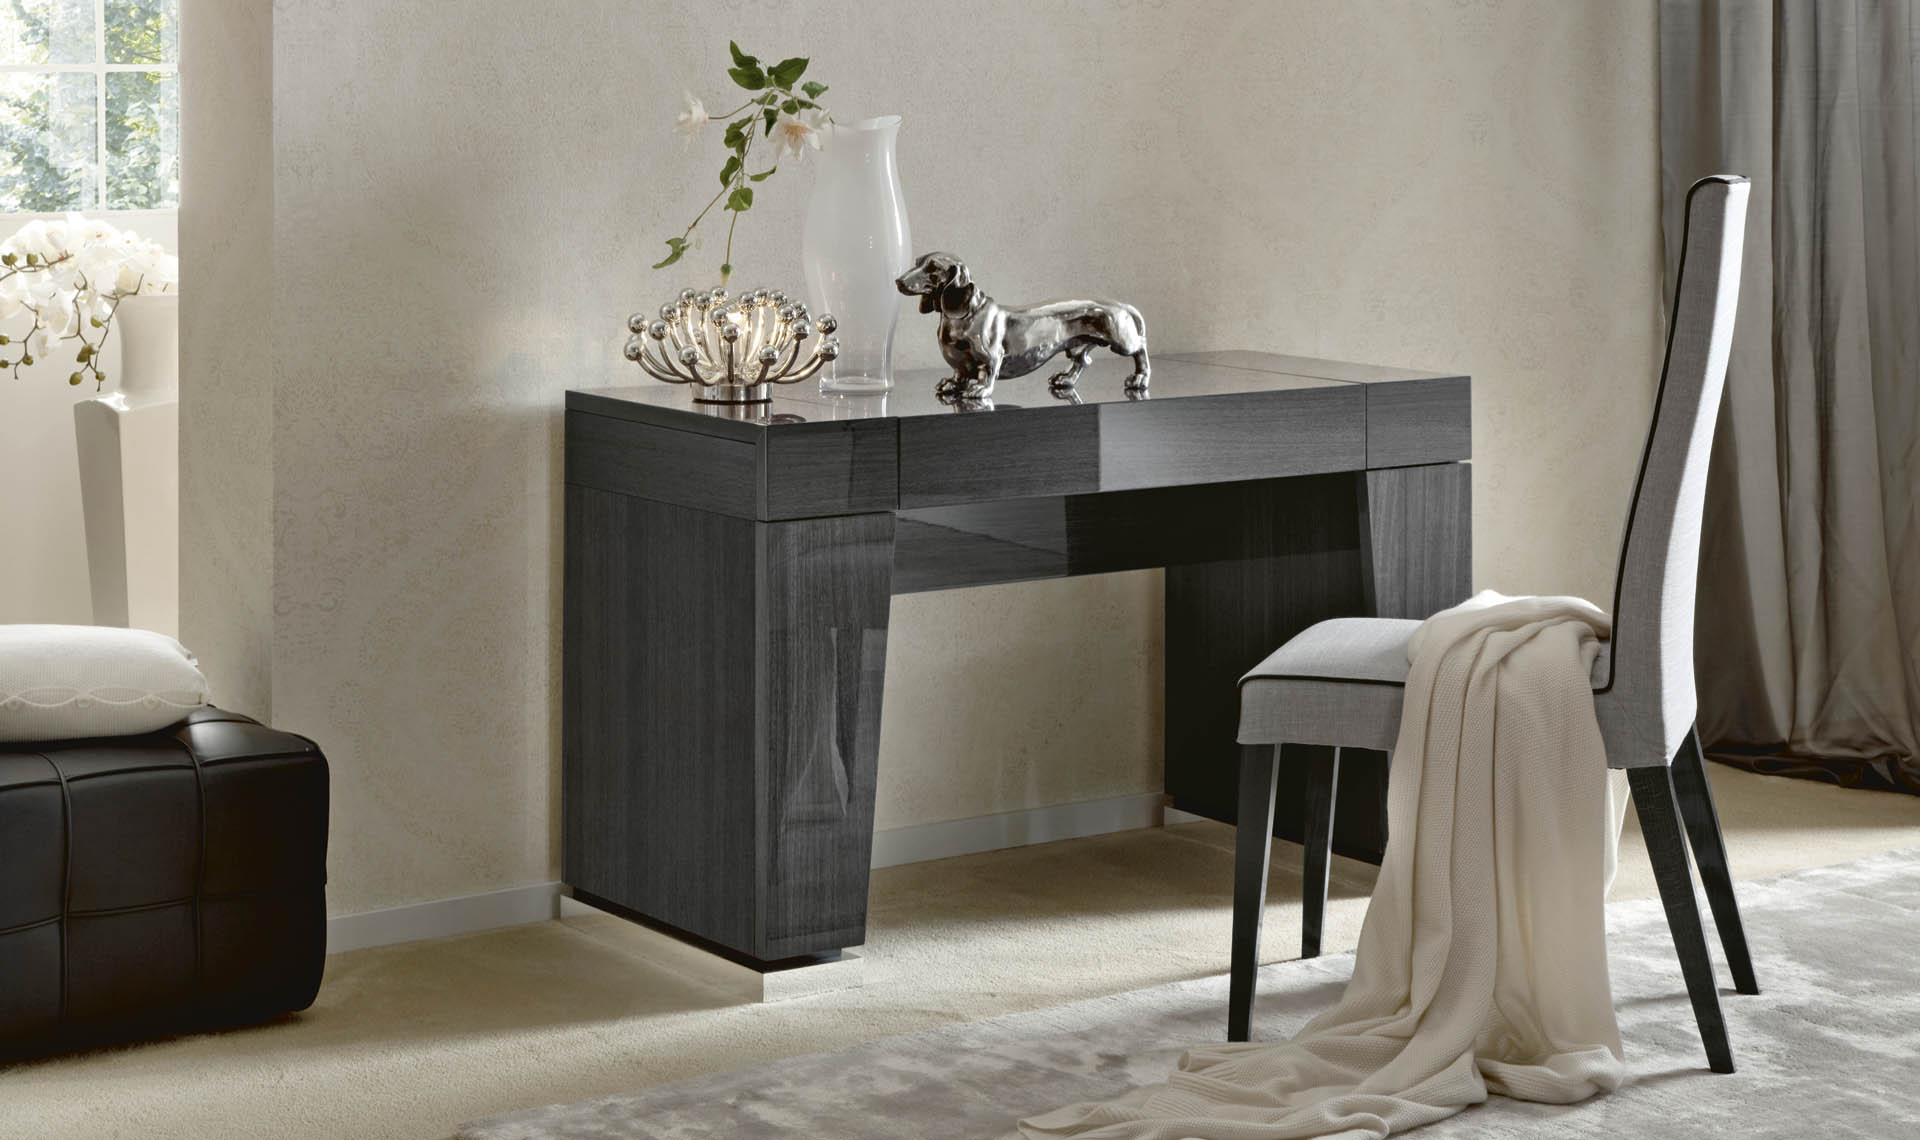 Montecarlo Bedroom Dressing Table & Chair